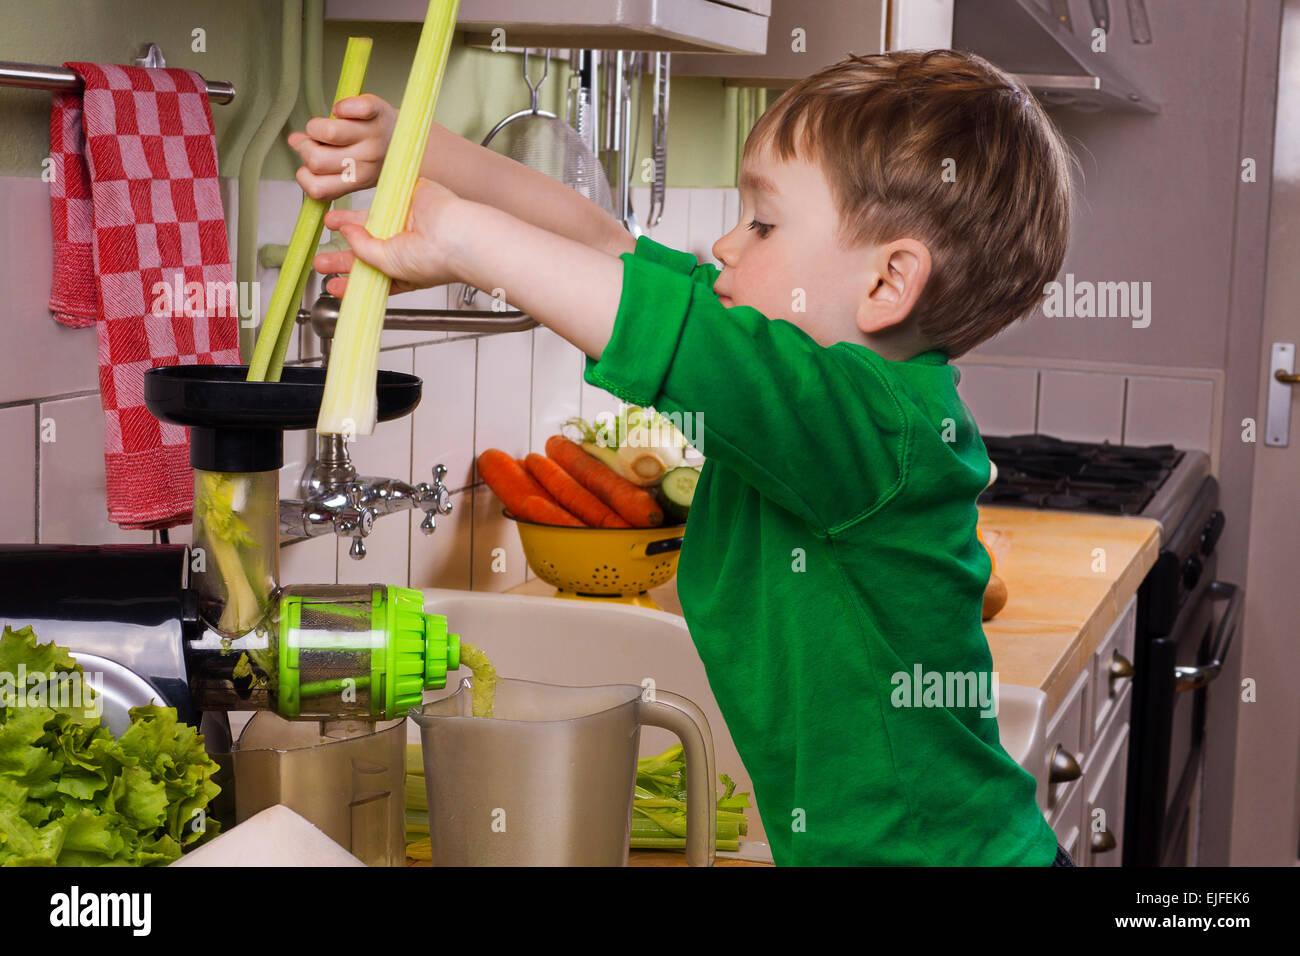 Little boy making green juice - Stock Image